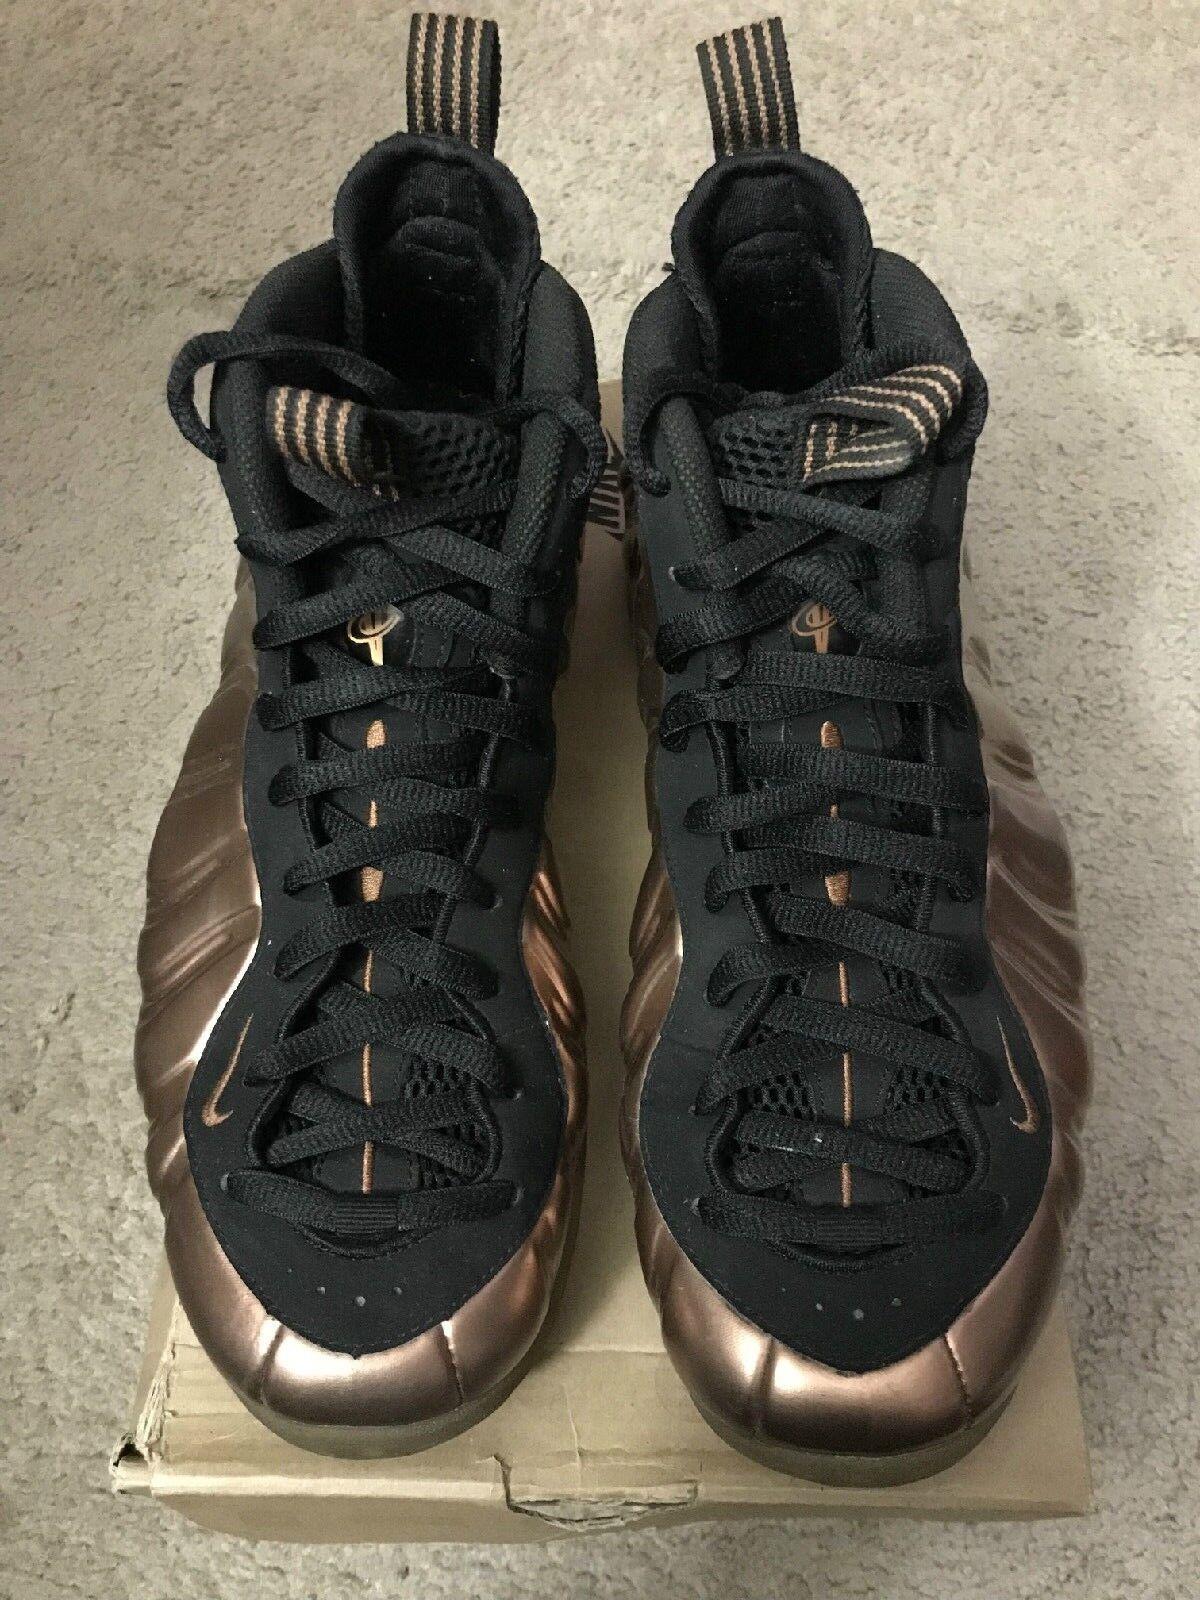 Nike Air Foamposite One 2010 Metallic Copper  Size 8.5  314996-081